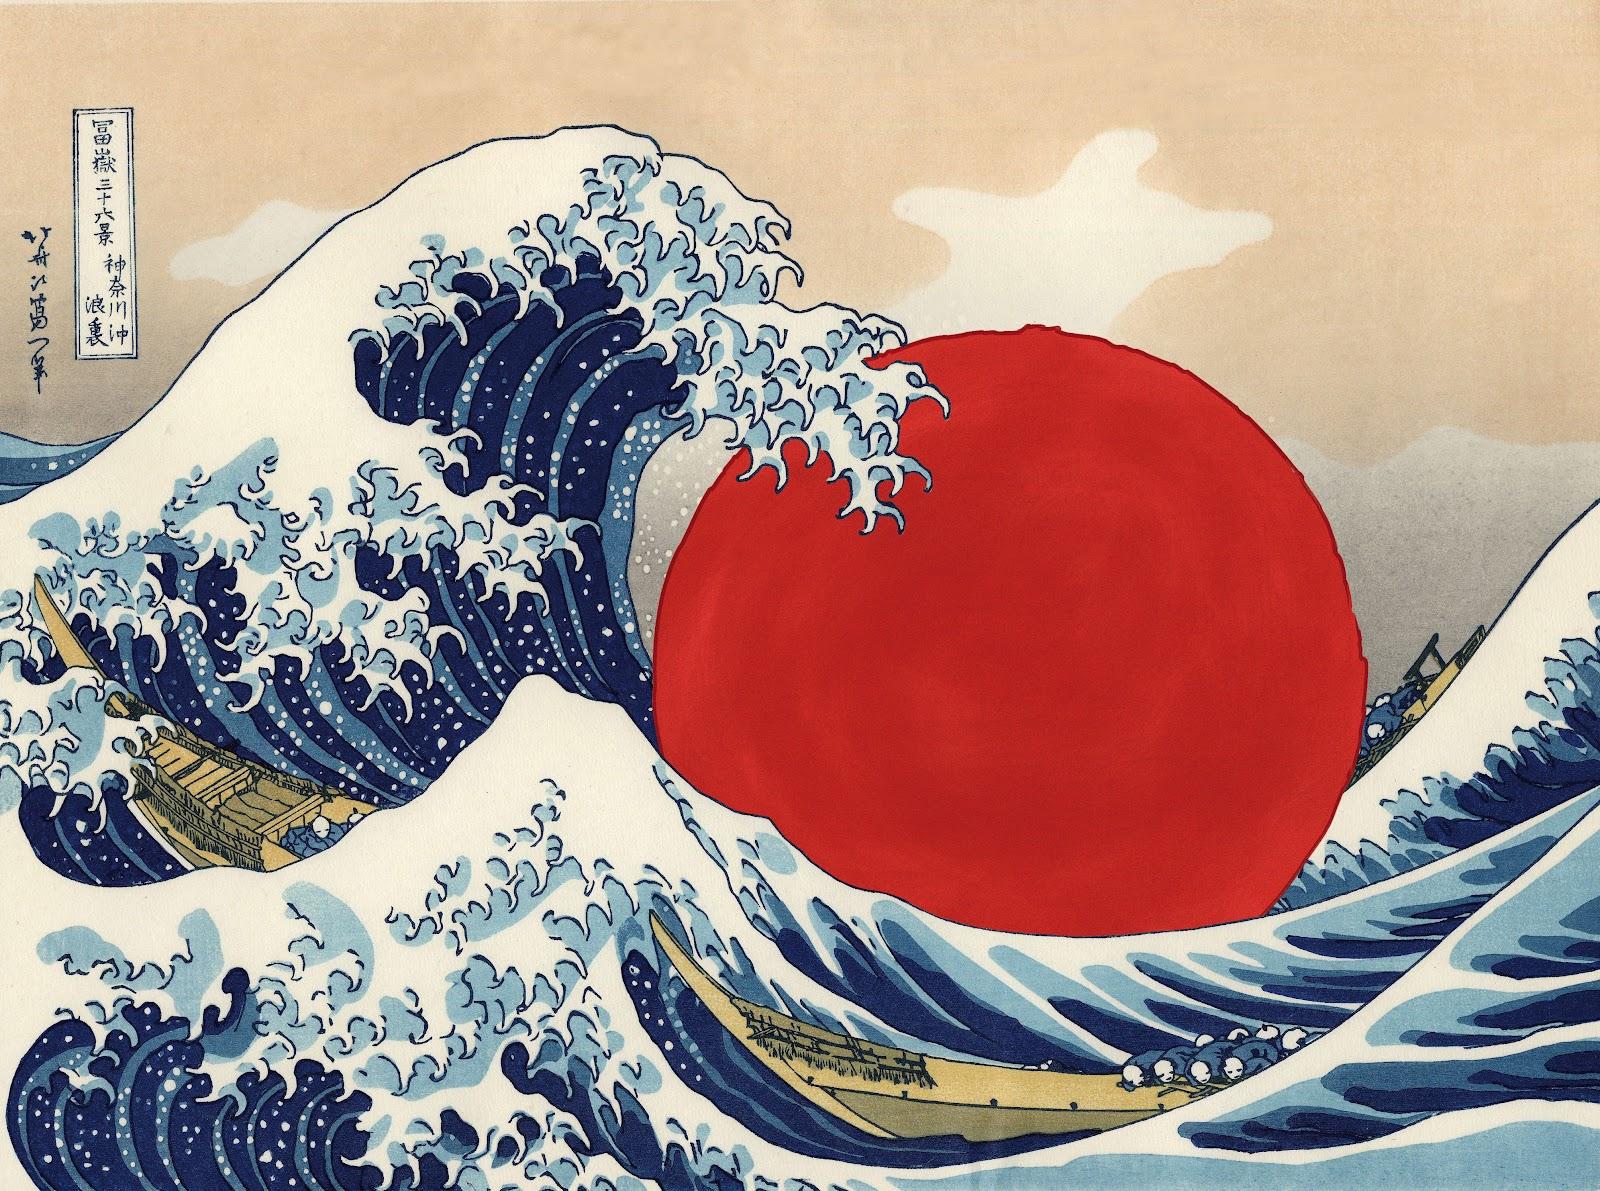 sandor laszlo design: The great wave off kanagawa – update ...